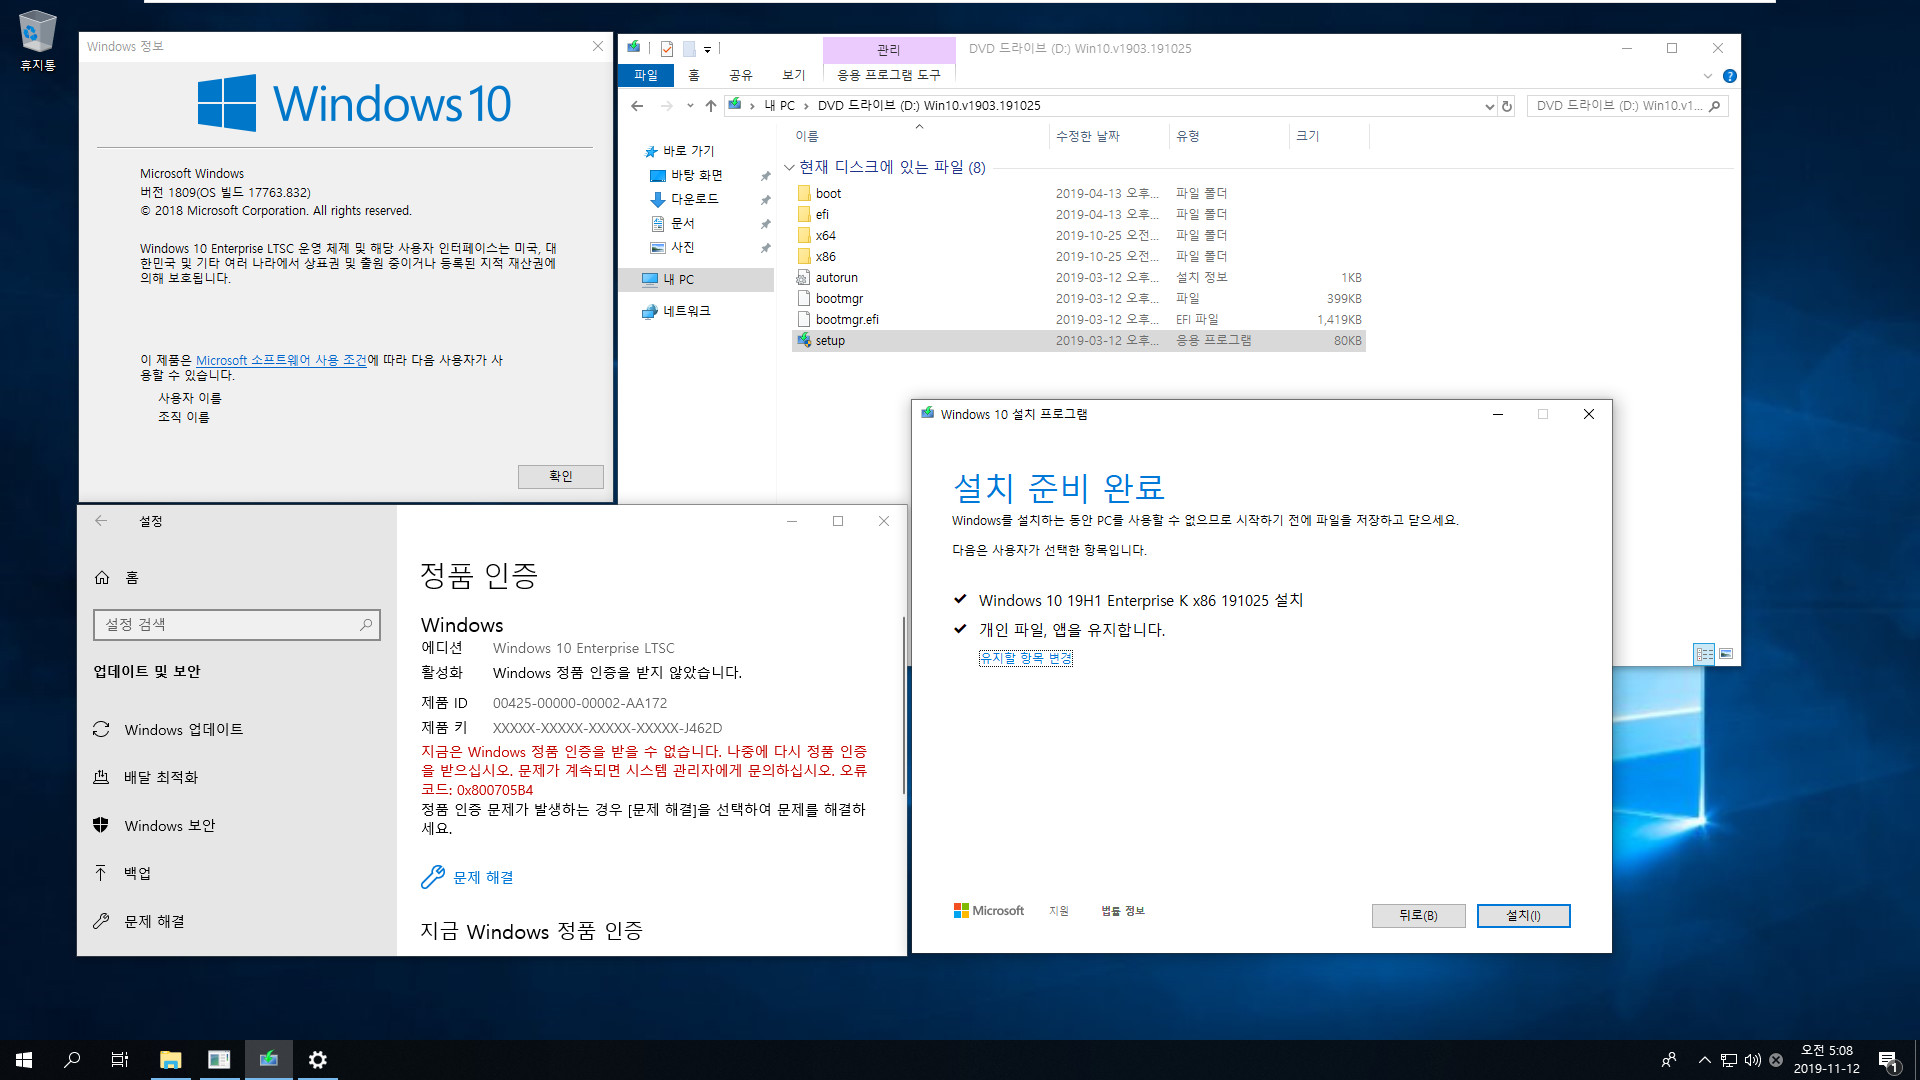 Windows 10 Enterprise LTSC [2019] (버전 1809) 를 버전 1903 프로로 업그레이드 설치하기 - 우선 설정과 앱 유지를 위해서 버전 1903 Enterprise로 업그레이드 한 후에 버전 1903 Pro로 변경하면 됩니다 2019-11-12_050852.jpg